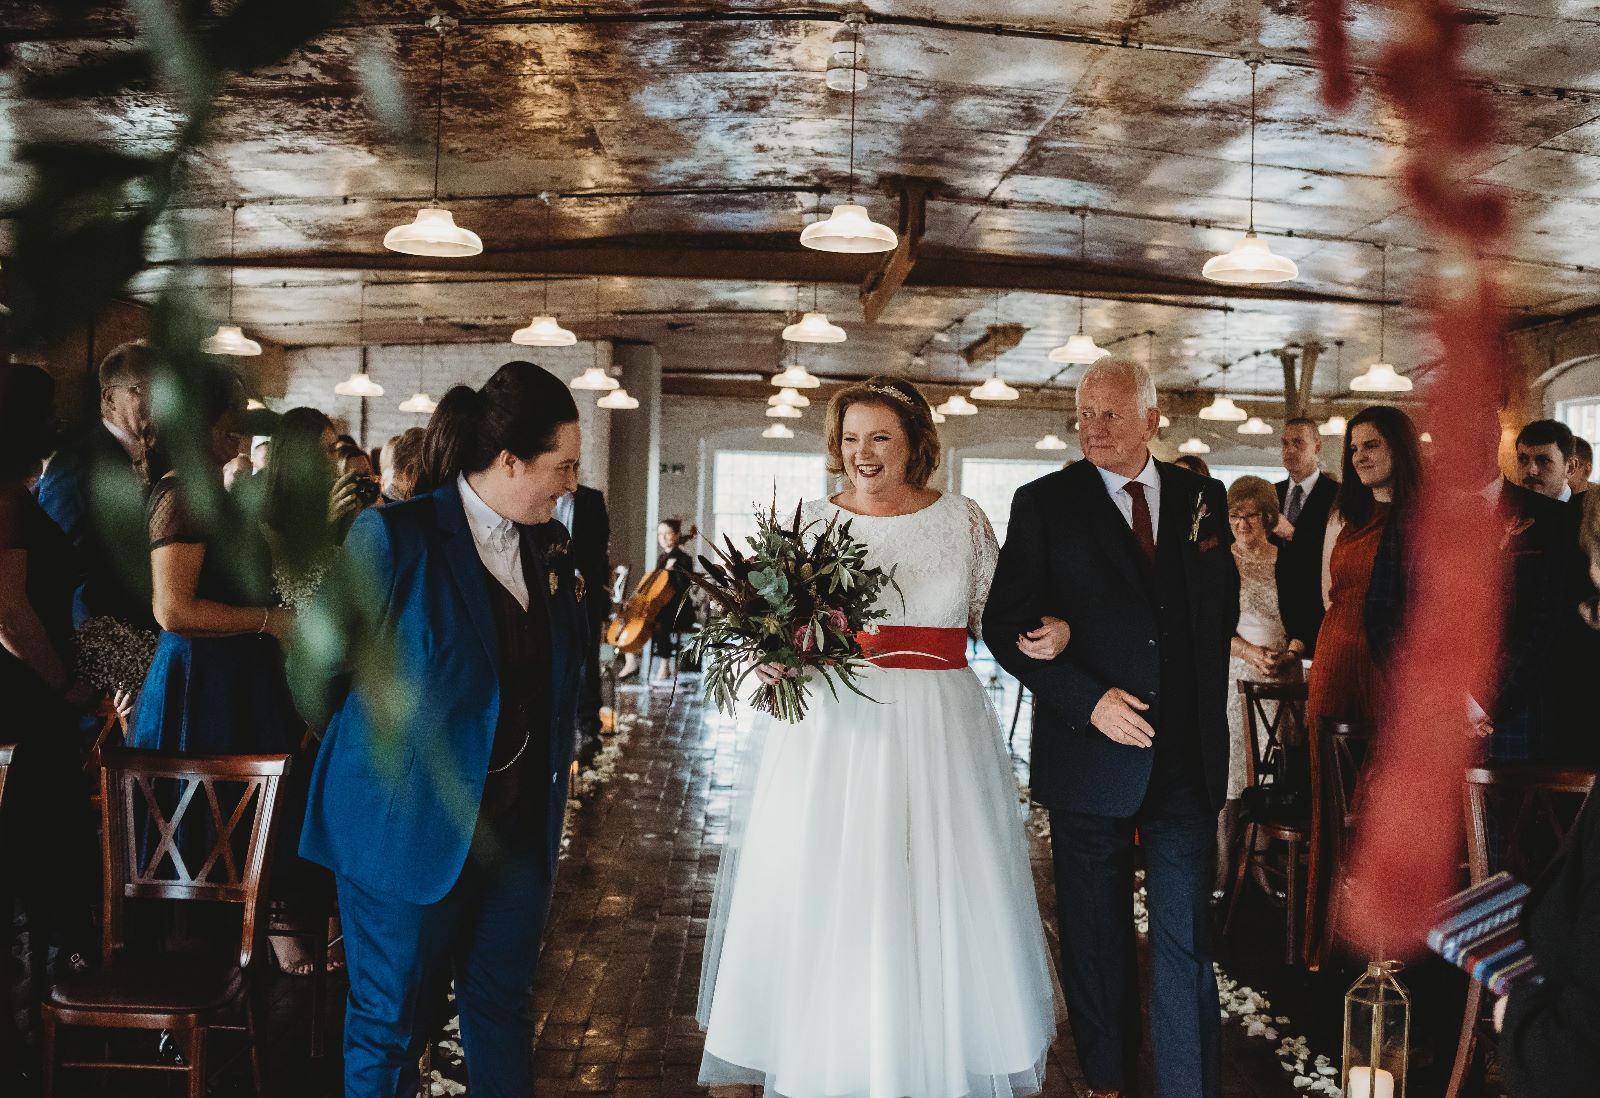 Derbyshire same sex wedding photography